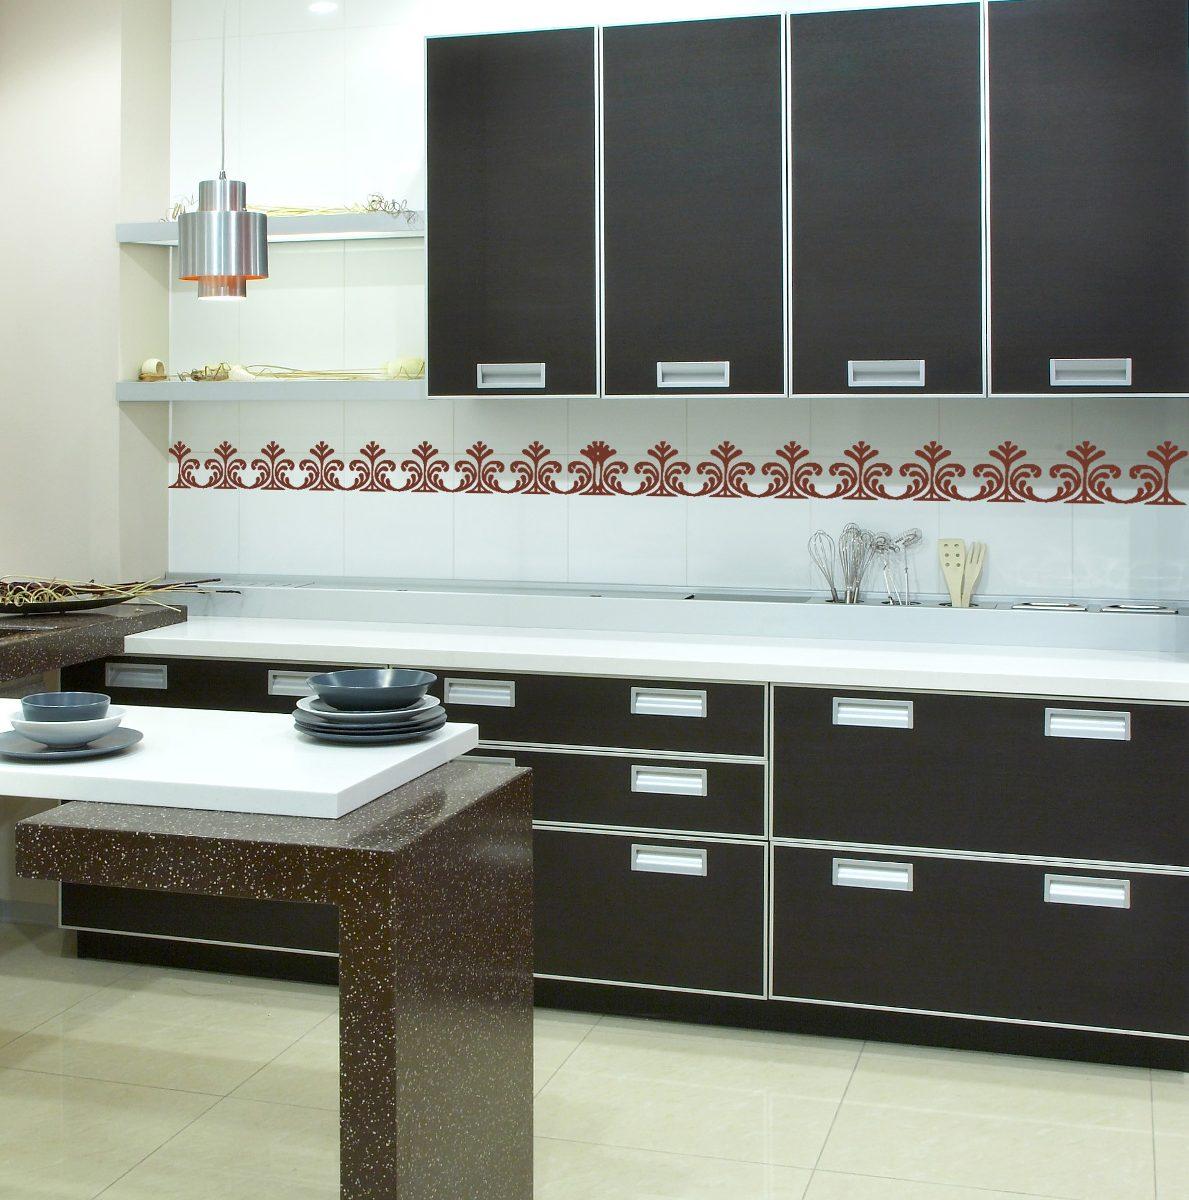 Aparador Kd Moveis ~ Adesivo De Parede Decorativo Faixa Border, Cozinha